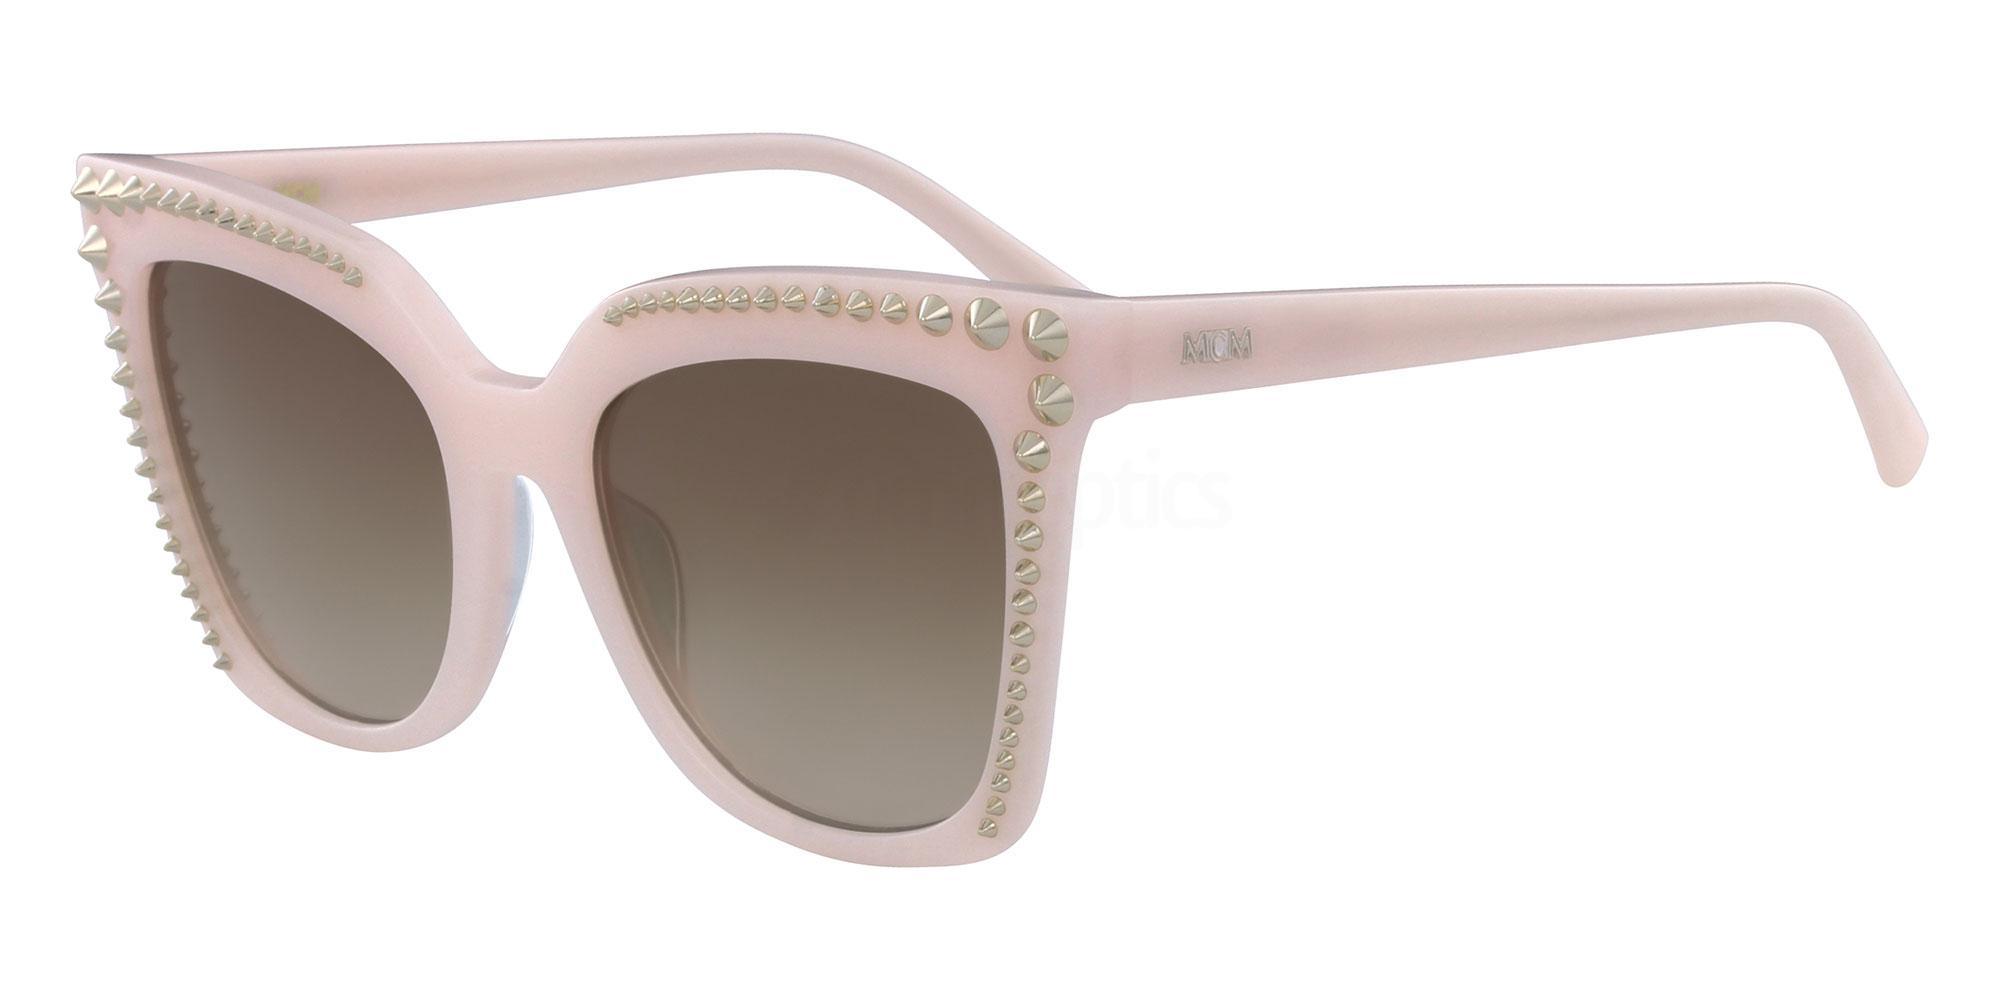 666 MCM669S Sunglasses, MCM